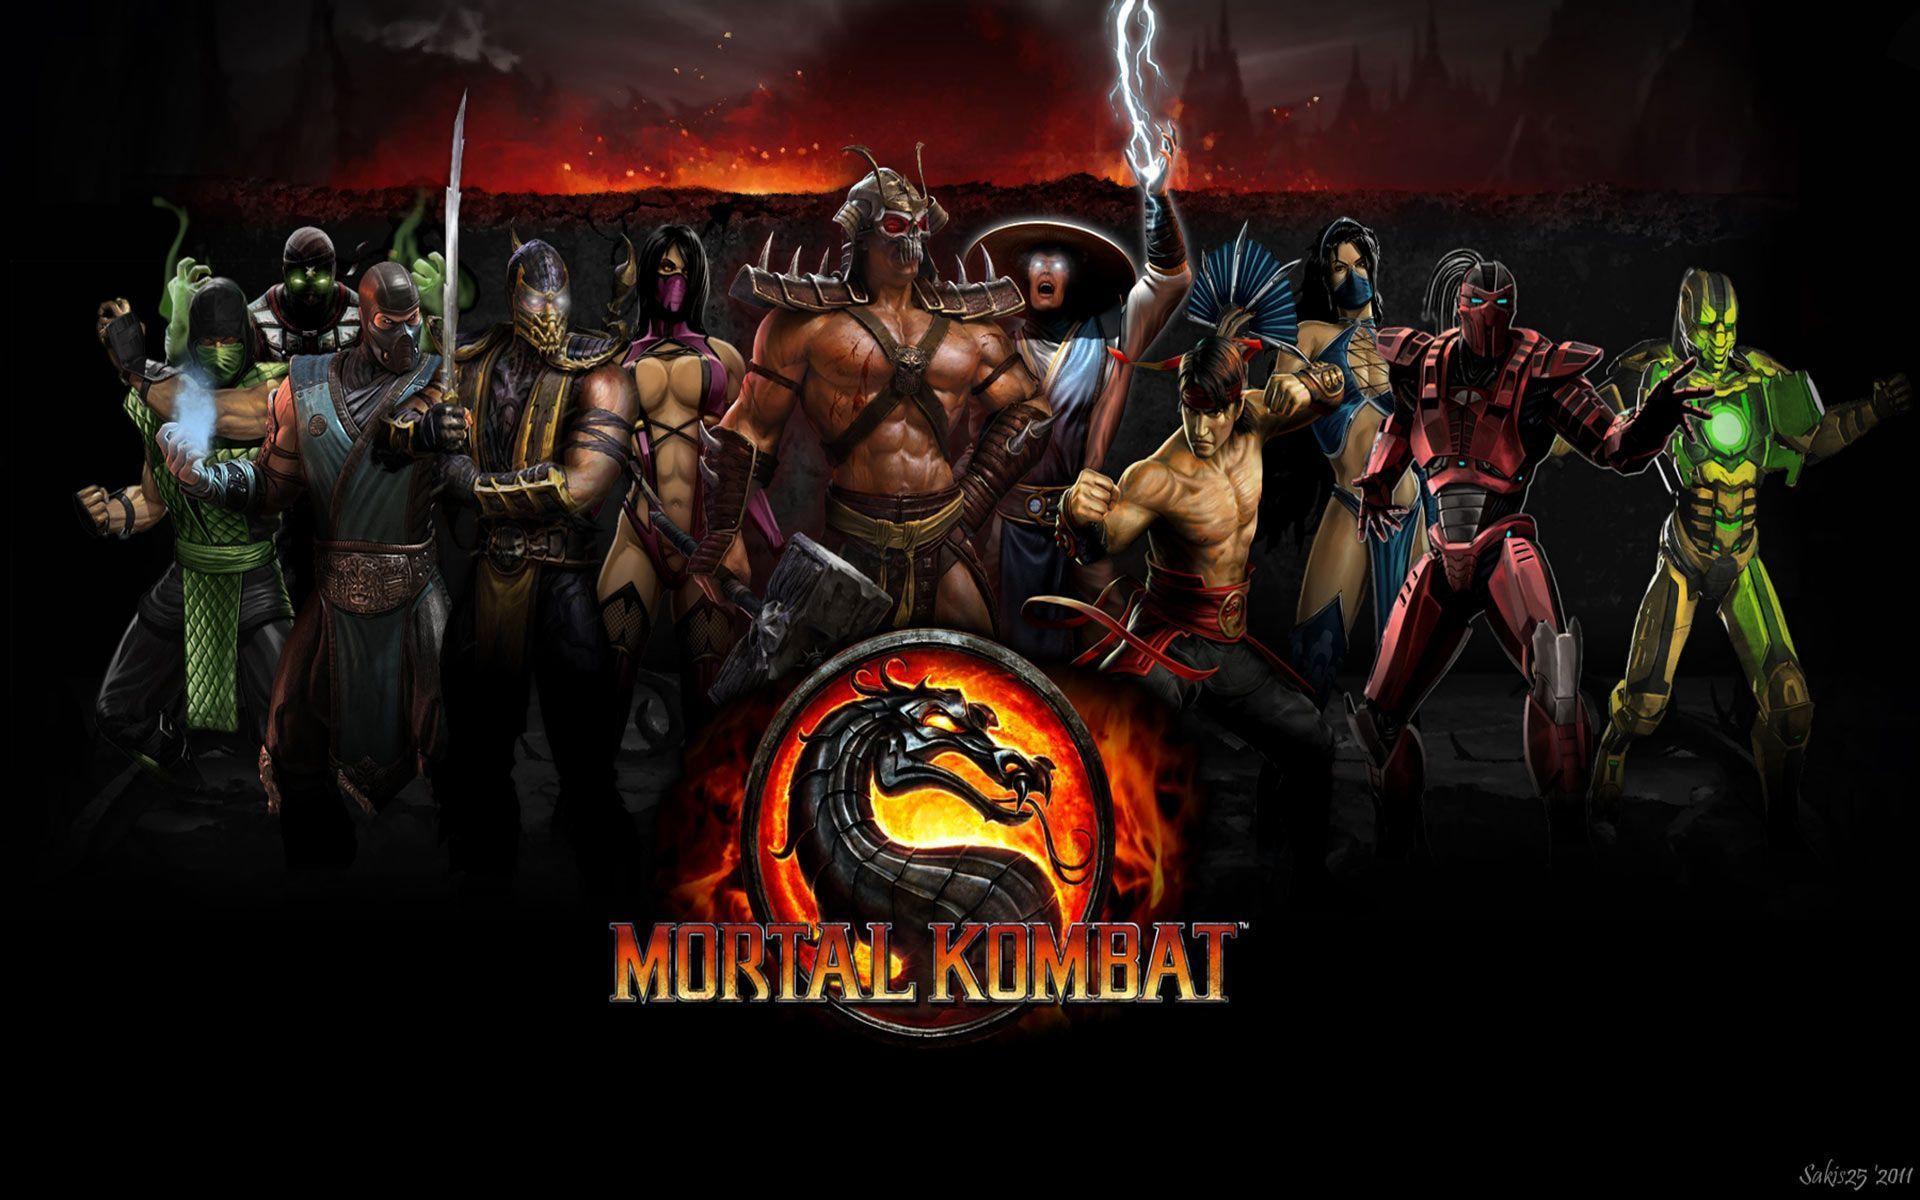 Mortal Kombat Characters Wallpapers Wallpaper Cave